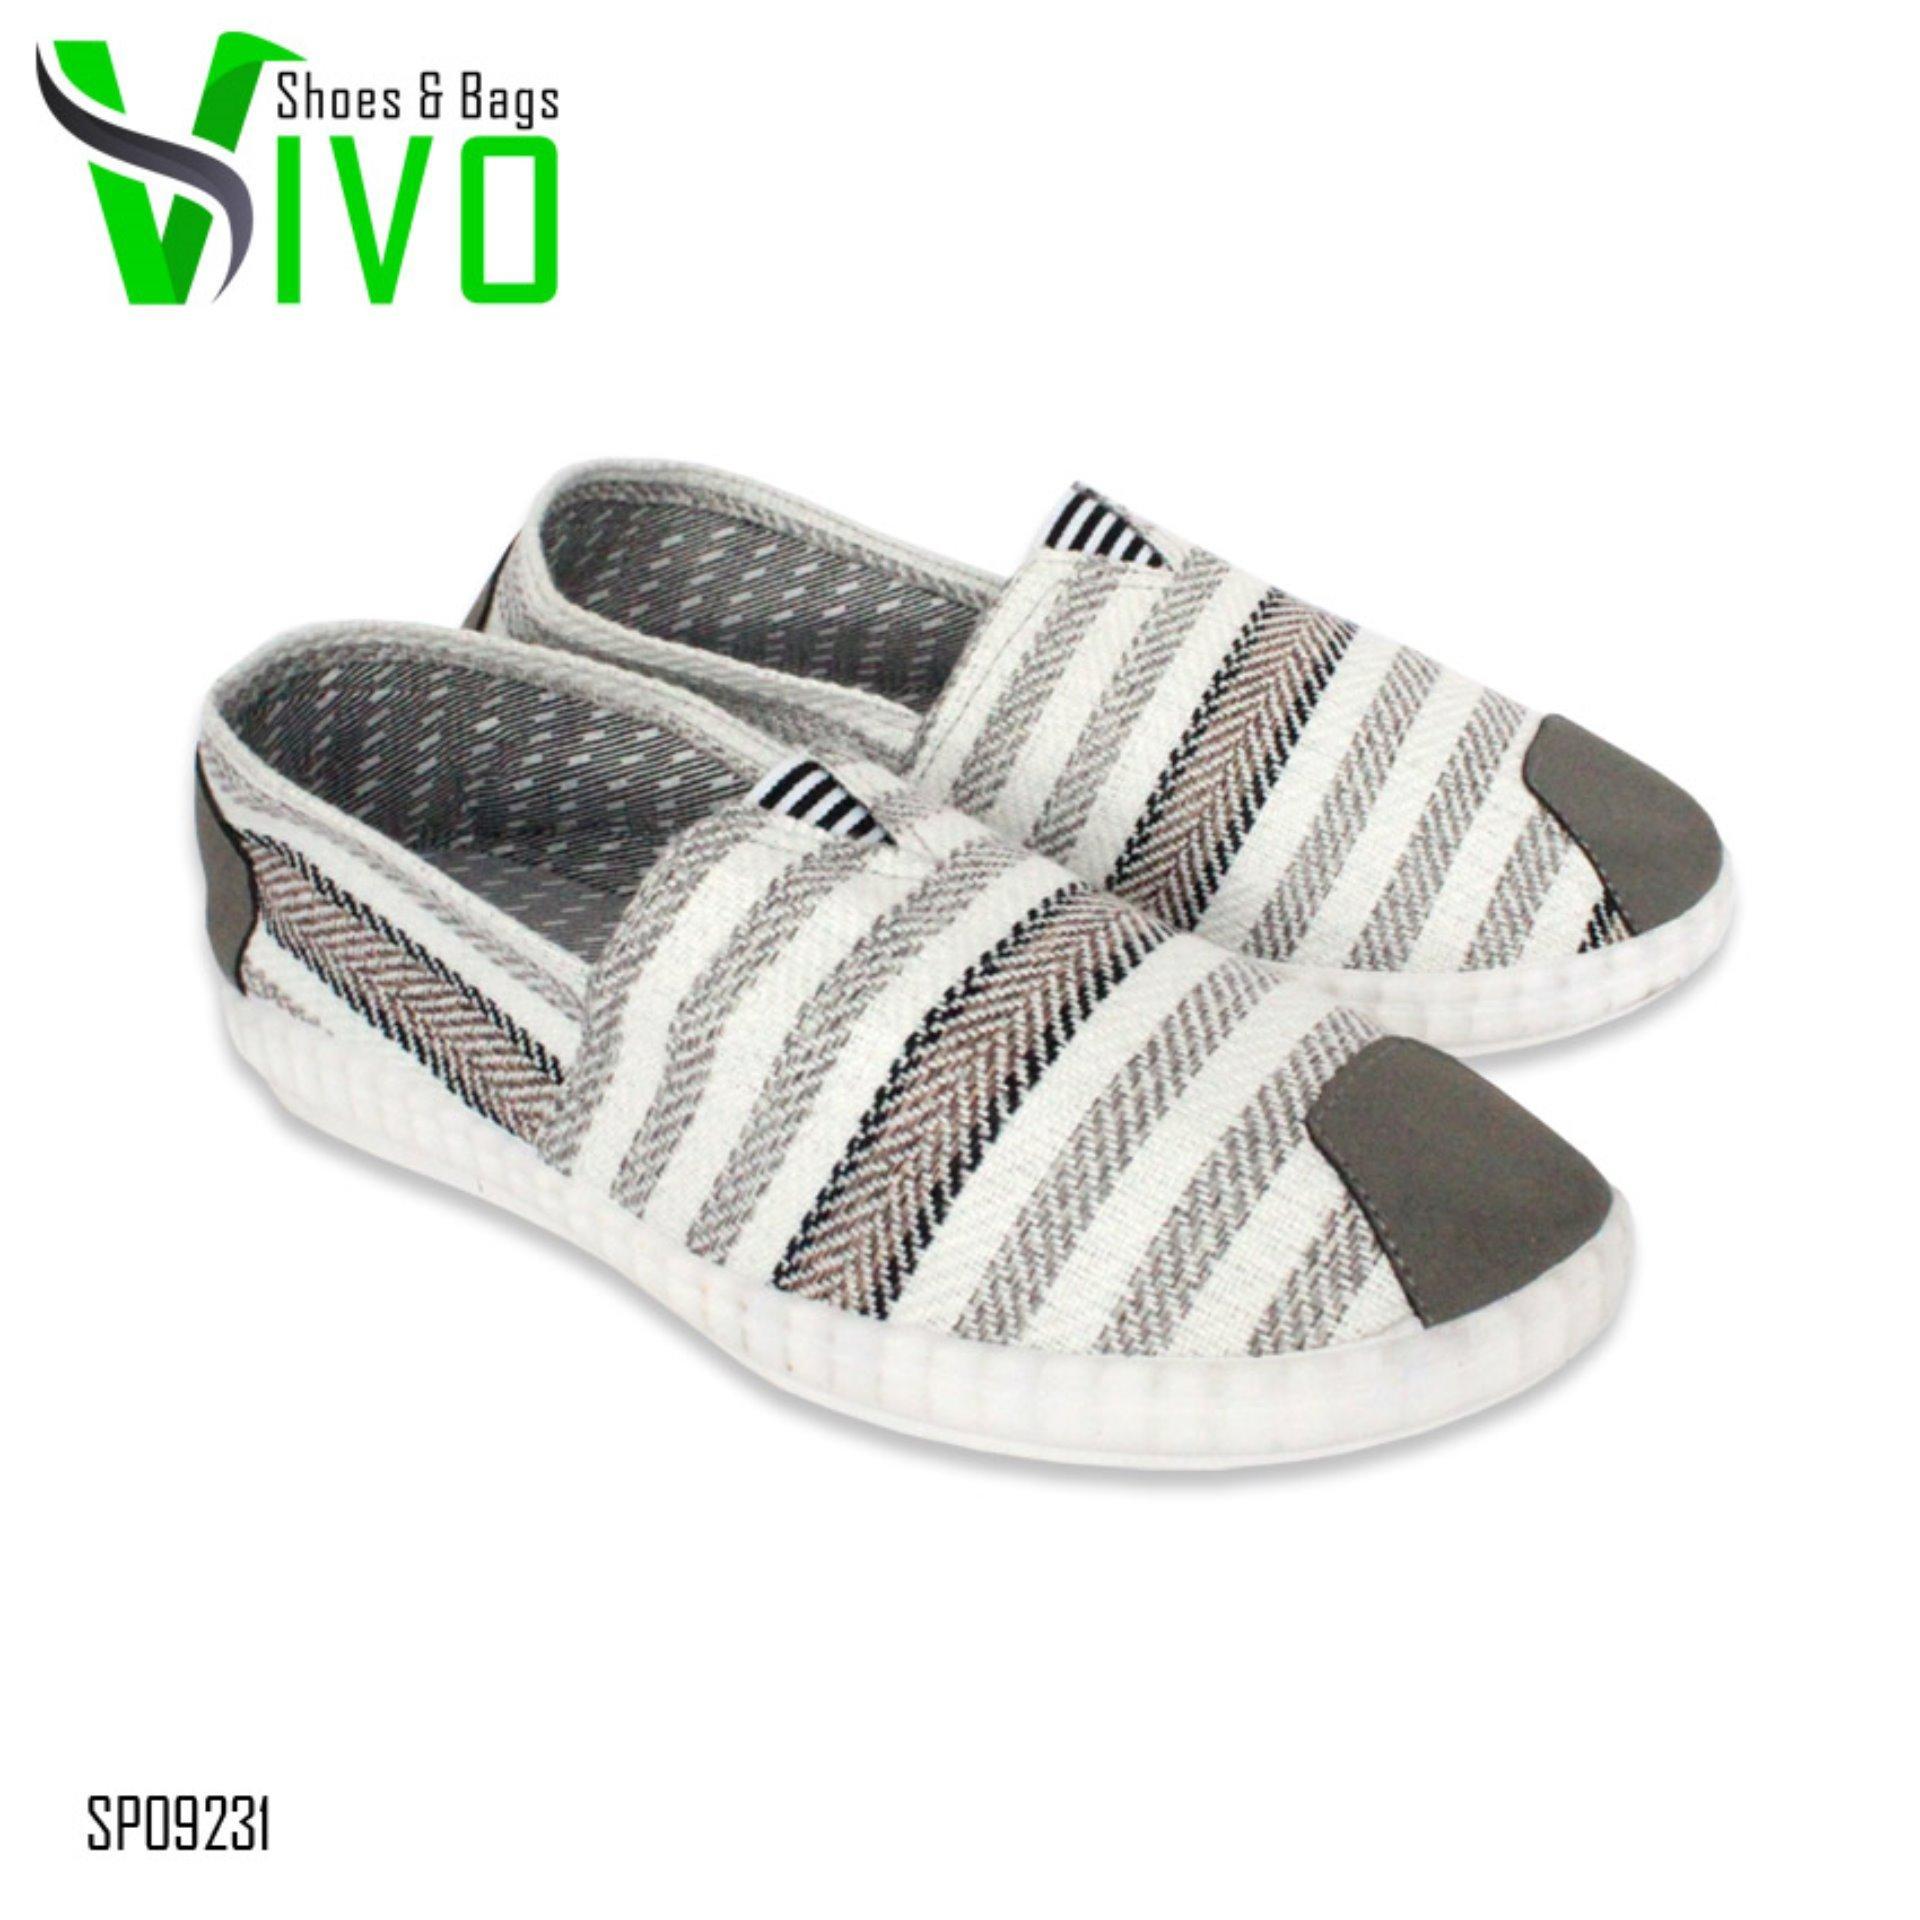 Milton Kanvas Sandal Sepatu Selop Casual Pria 02 Coklat Size 39 43 Homyped Confero 01 Tan Cokelat Muda 42 Vivo Kets Sneakers Dan Kasual